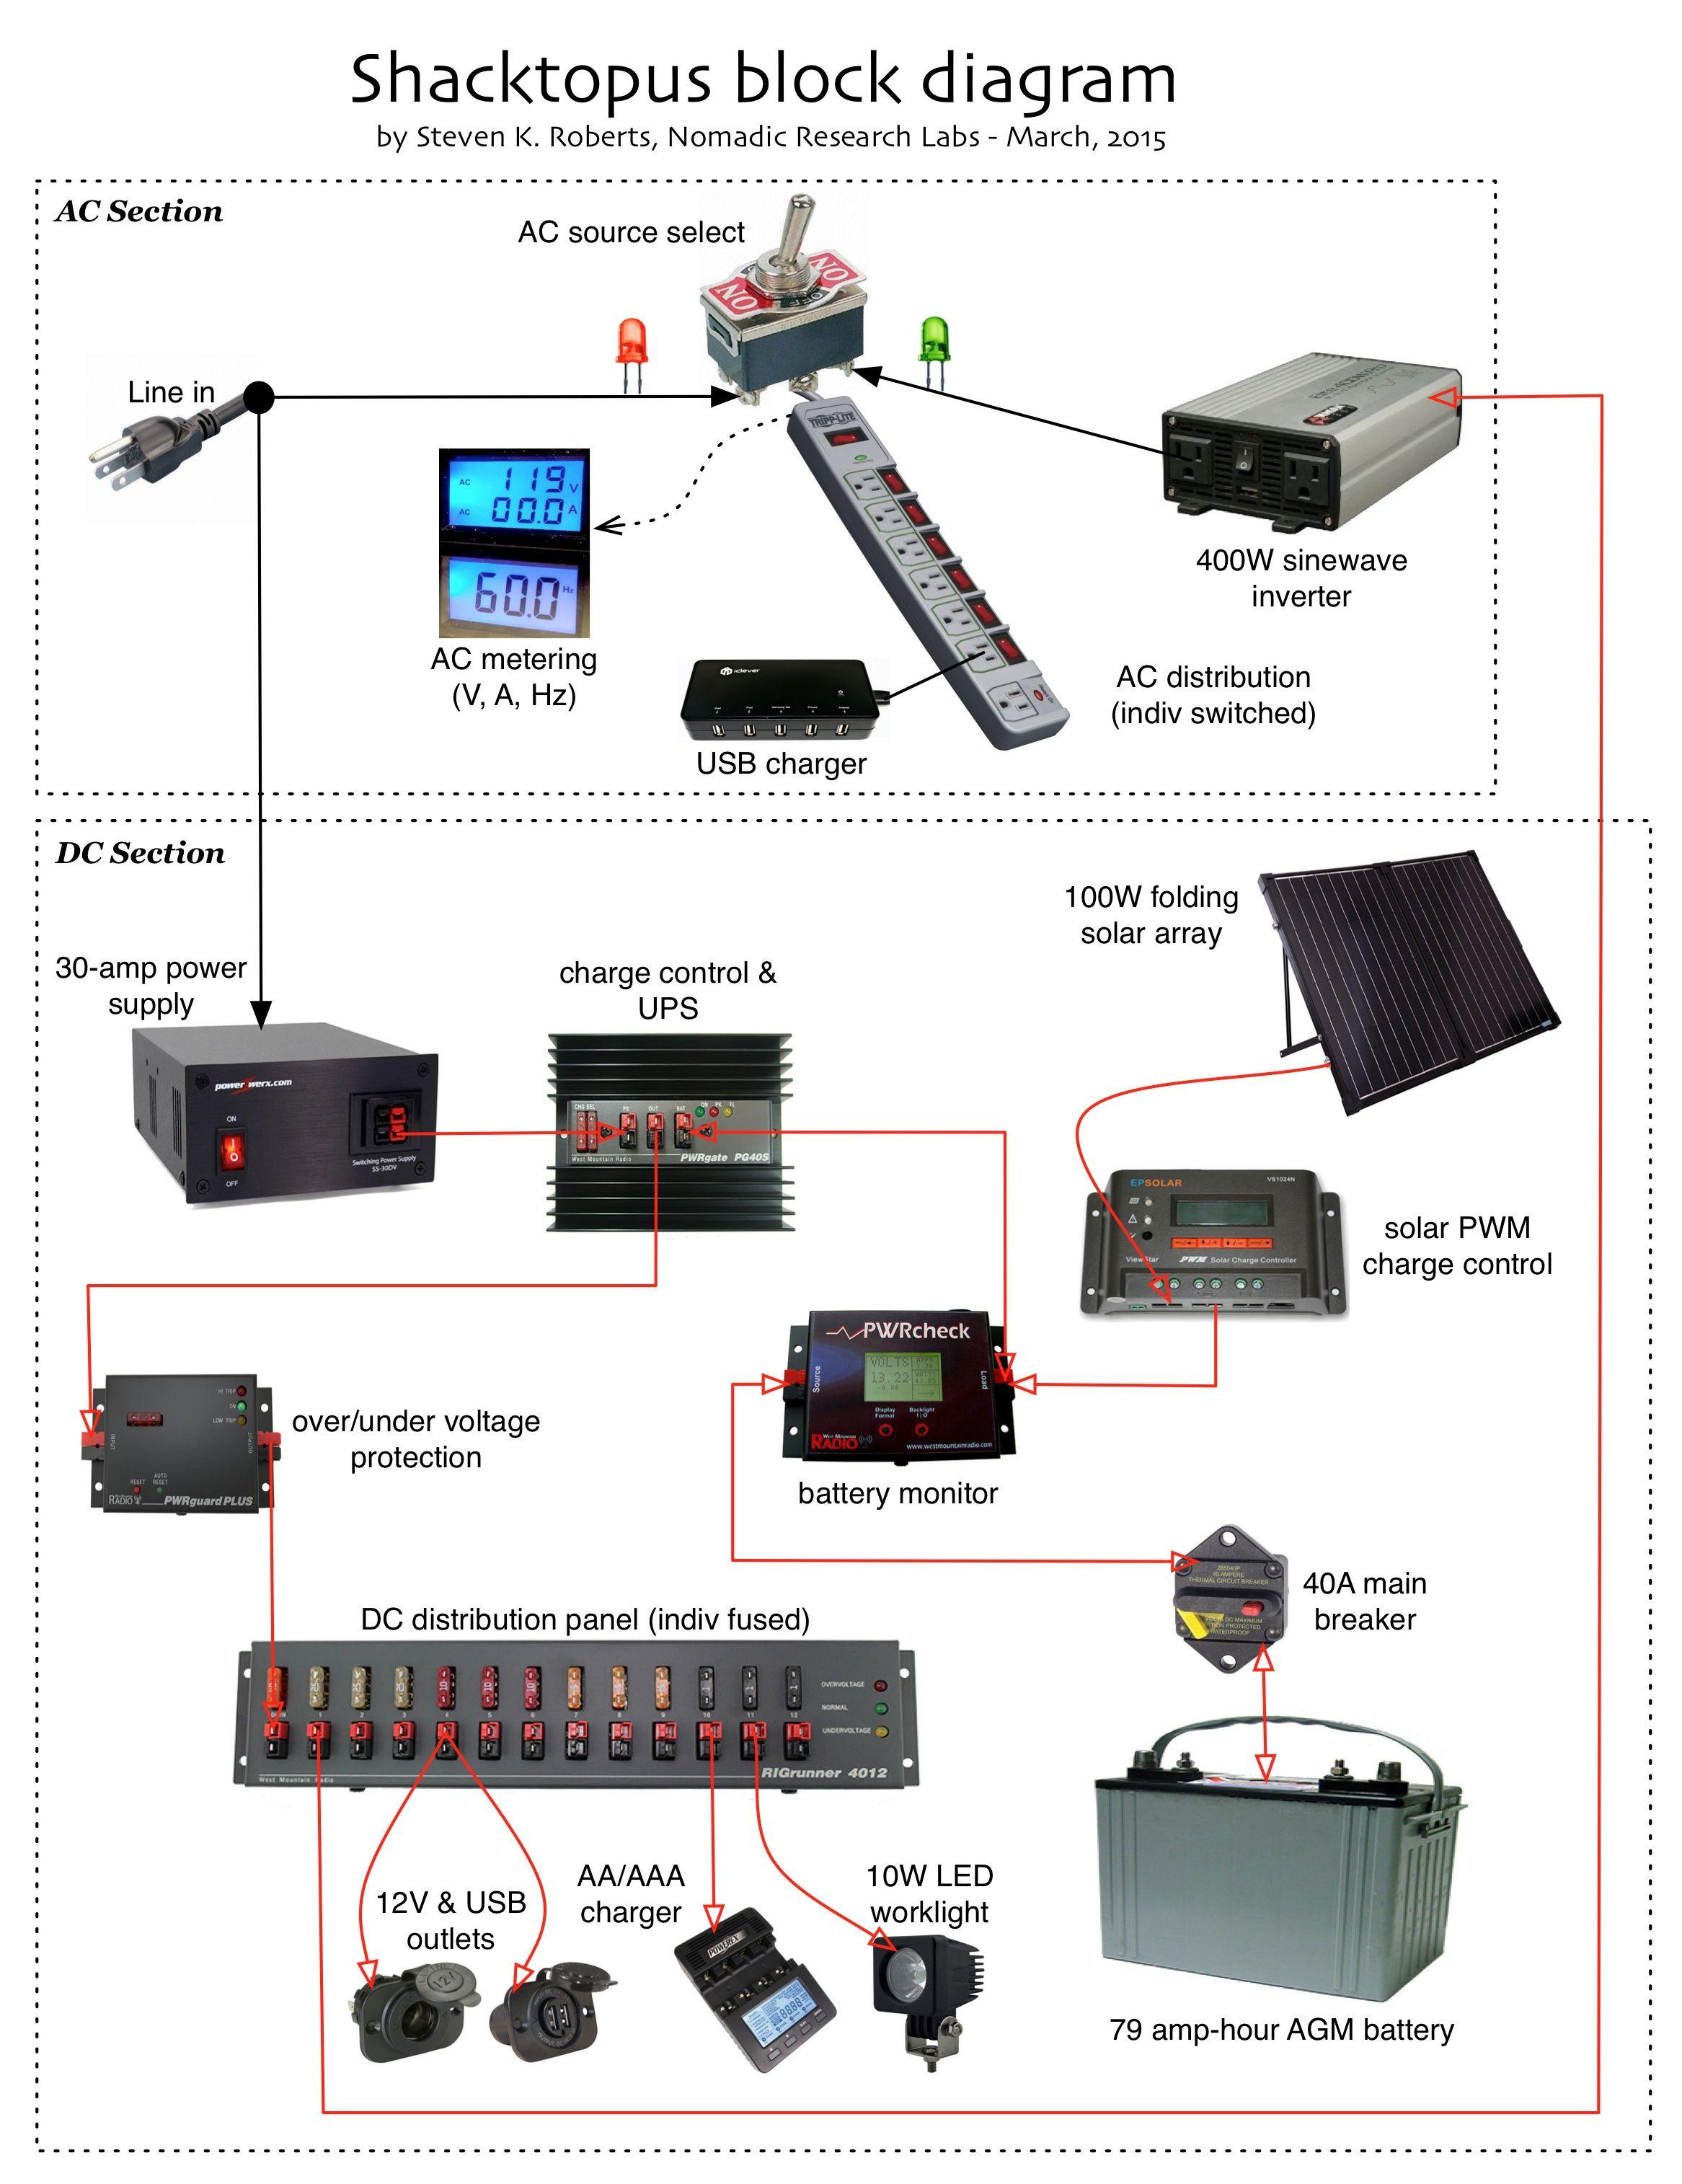 Sha01 Block Diagram Jpg 2 333 3 029 Pixels Portable Power Power Portable Ham Radio